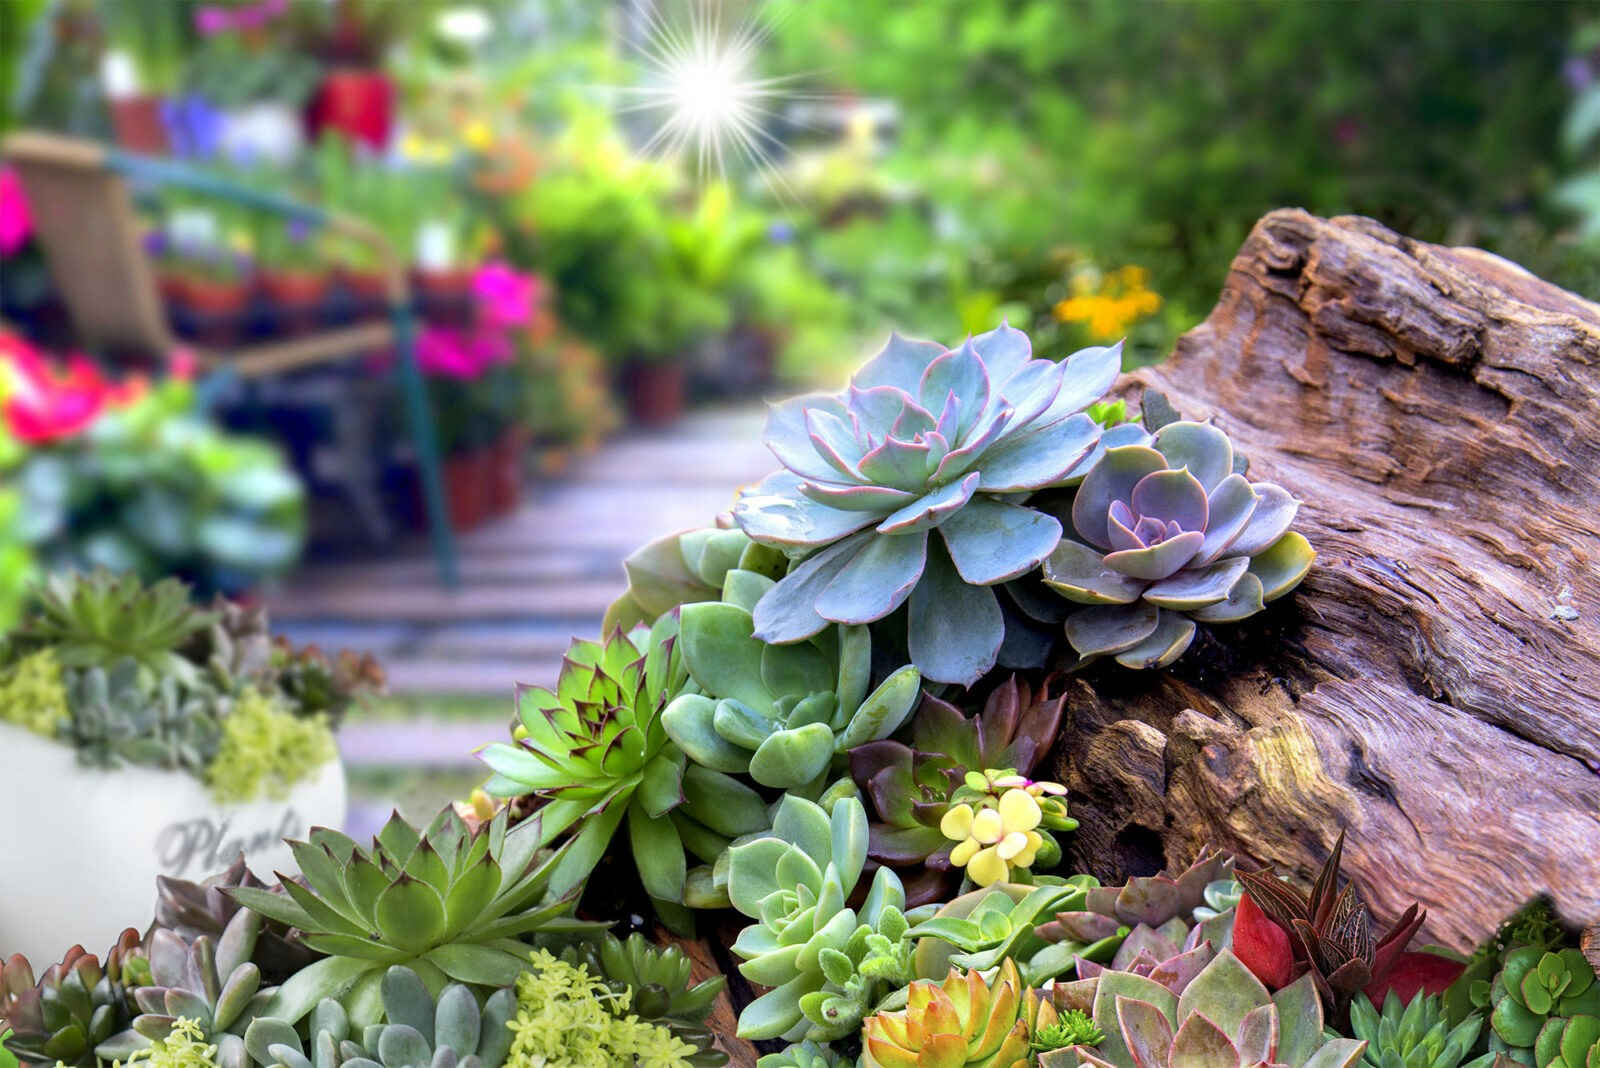 Miniature succulent plants in the garden.